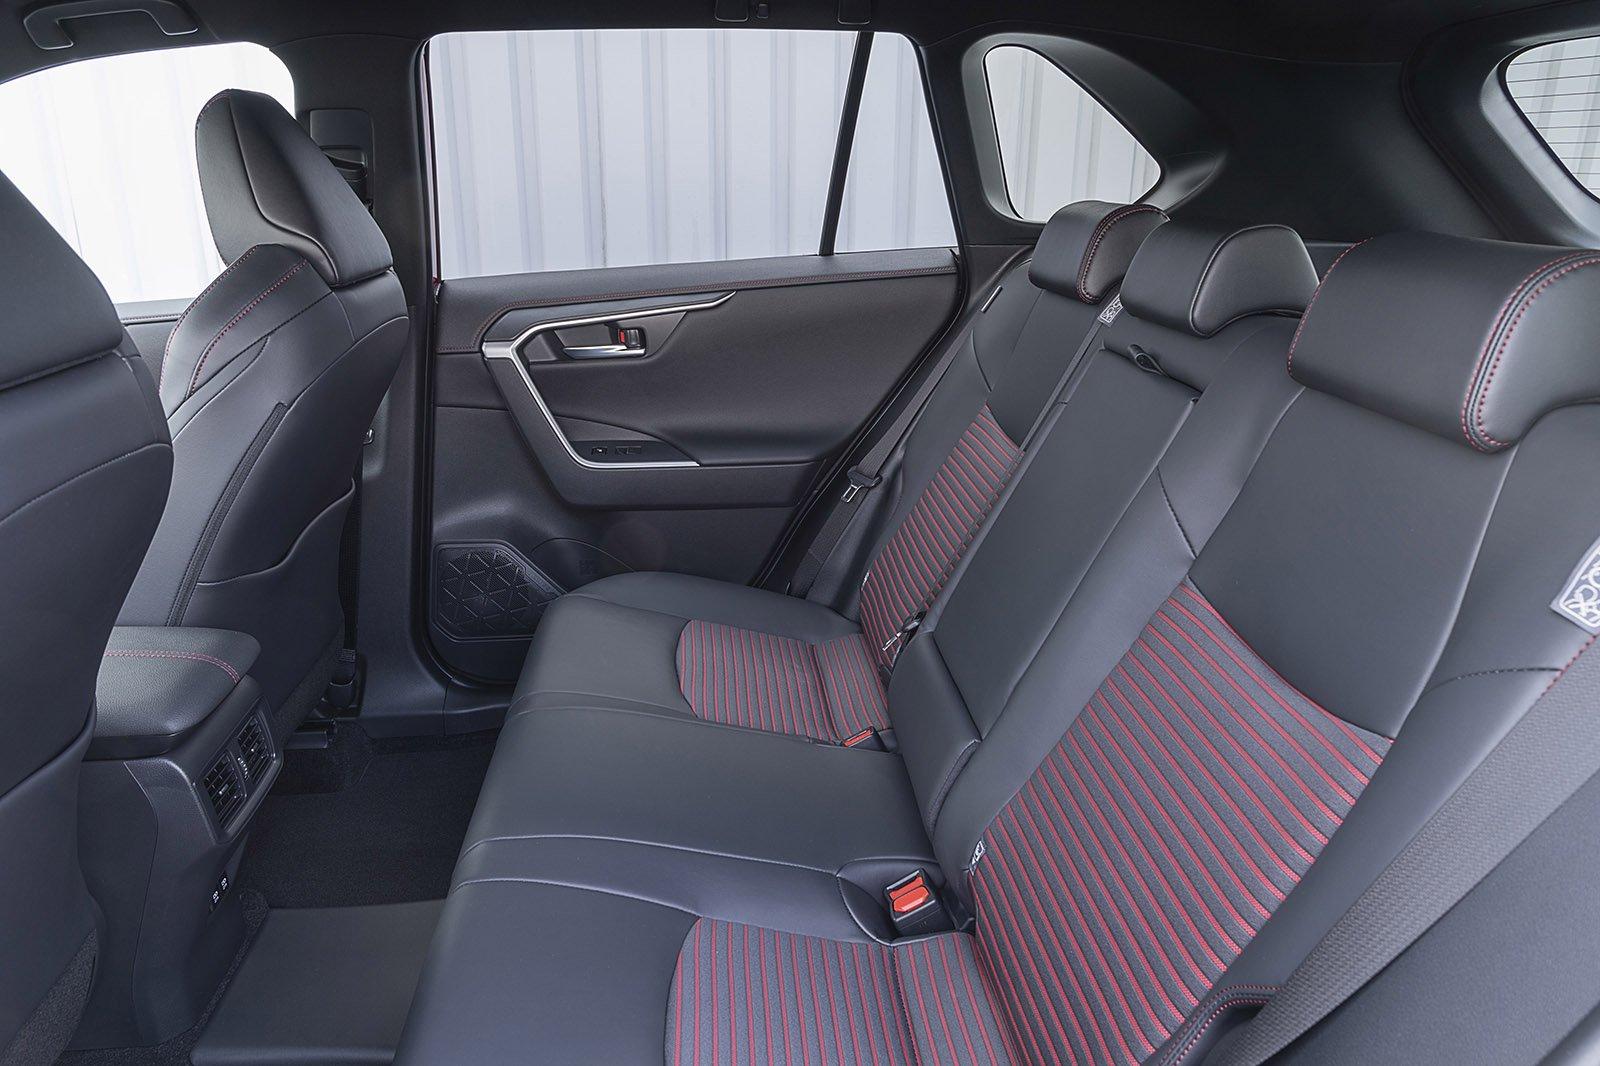 Suzuki Across PHEV 2020 rear seats